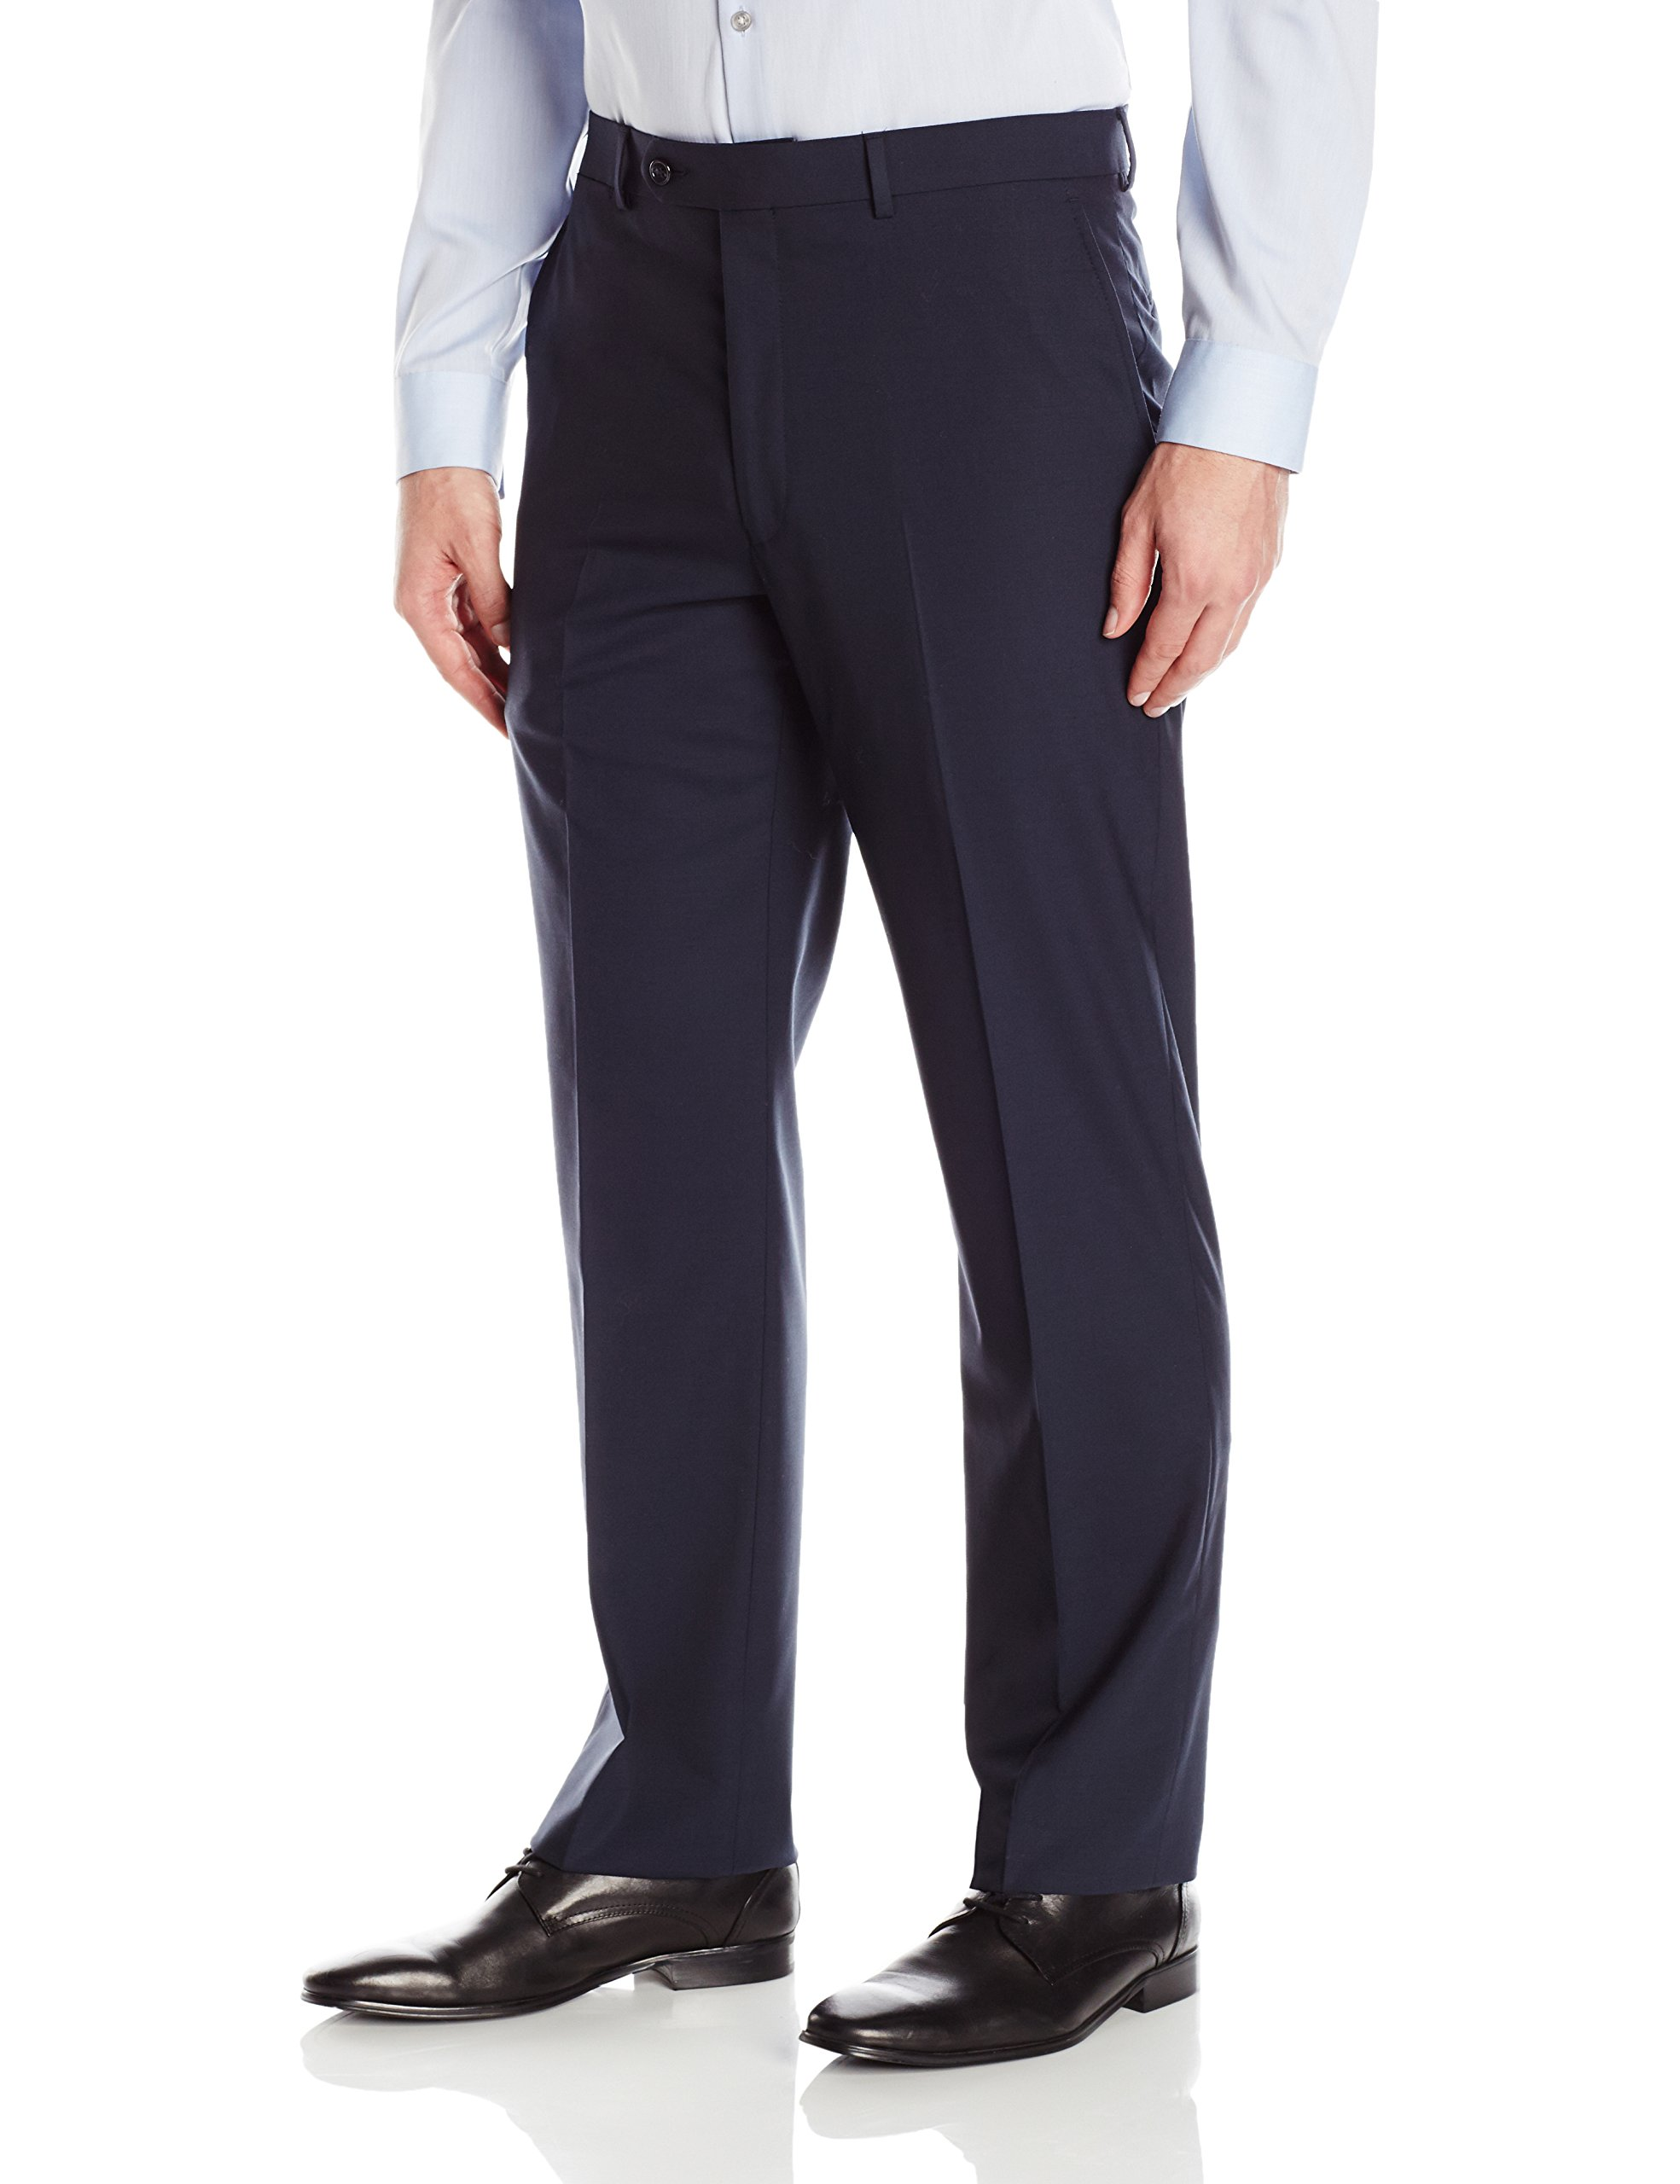 Hart Schaffner Marx Men's Chicago Fit Flat Front Dress Pant, Dark Blue, 38 Long by Hart Schaffner Marx